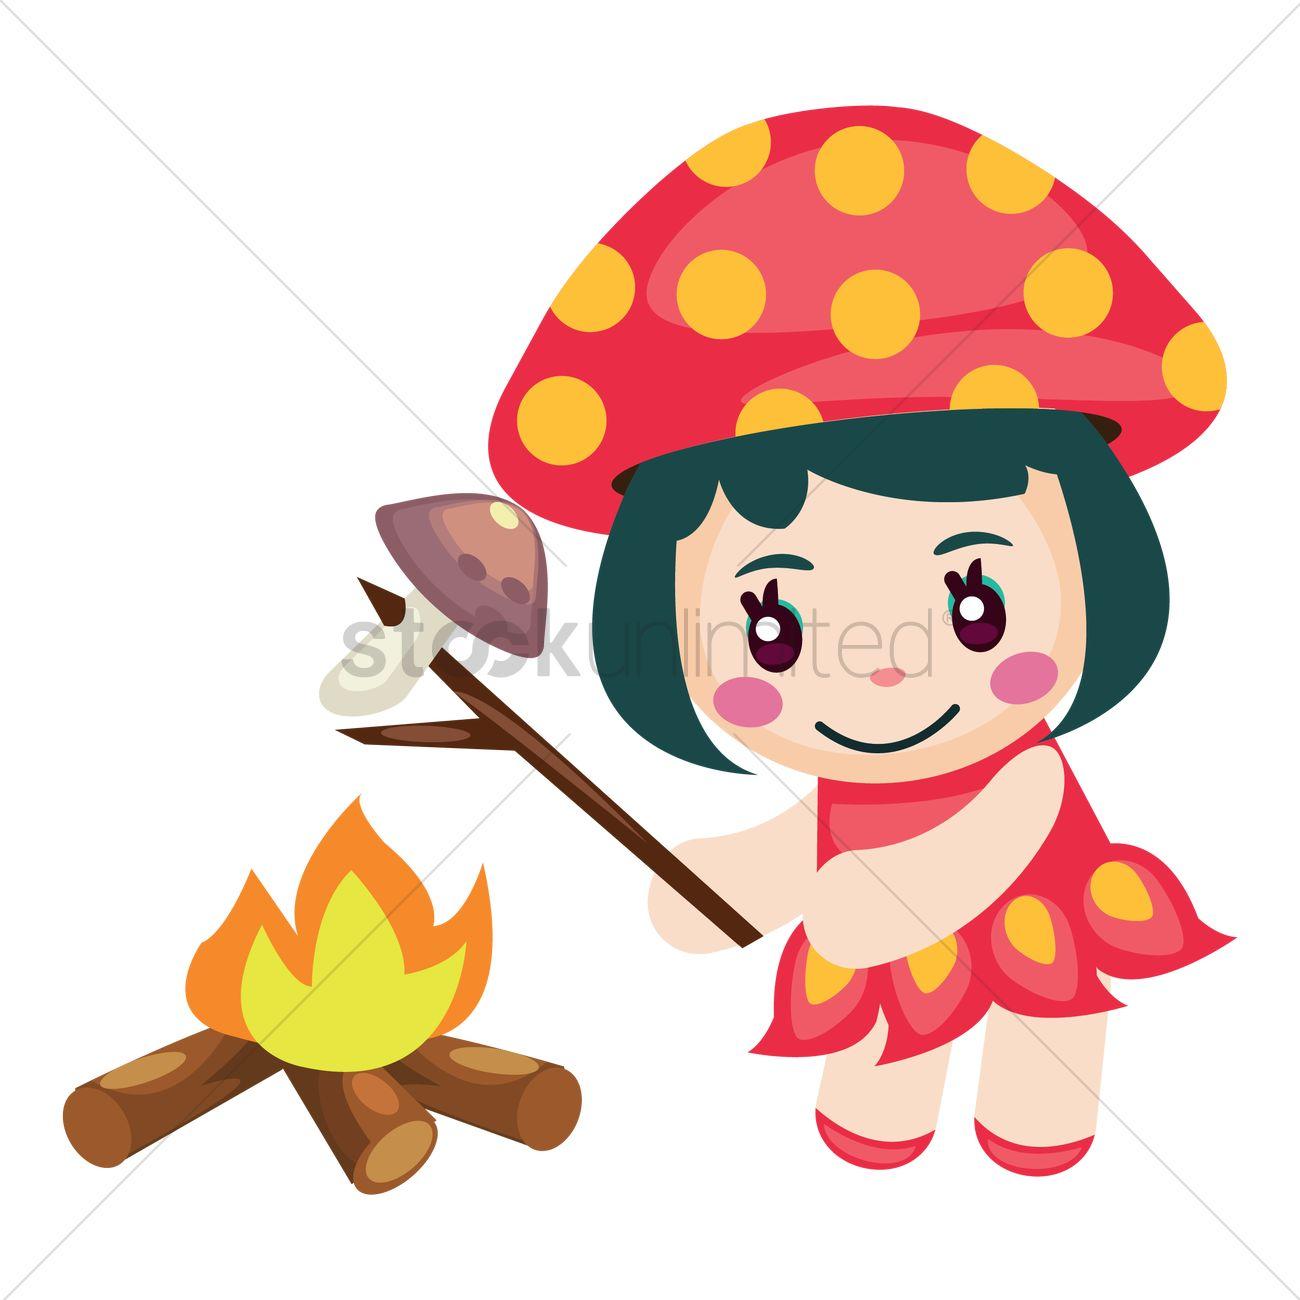 Fire mushroom clipart #16